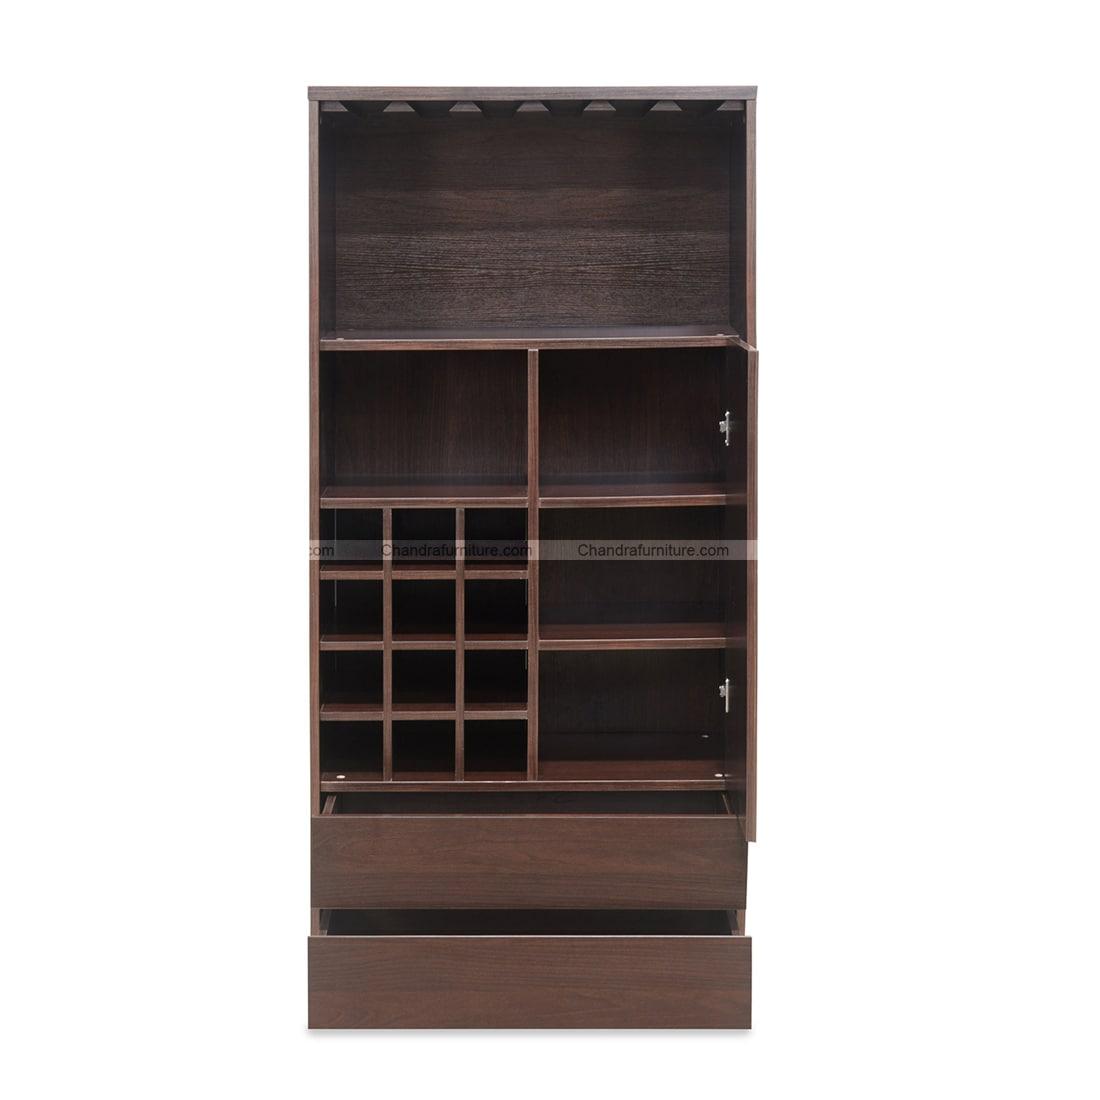 Chandra Furniture Daniel Big Bar Cabinet In Dark Walnut Finish